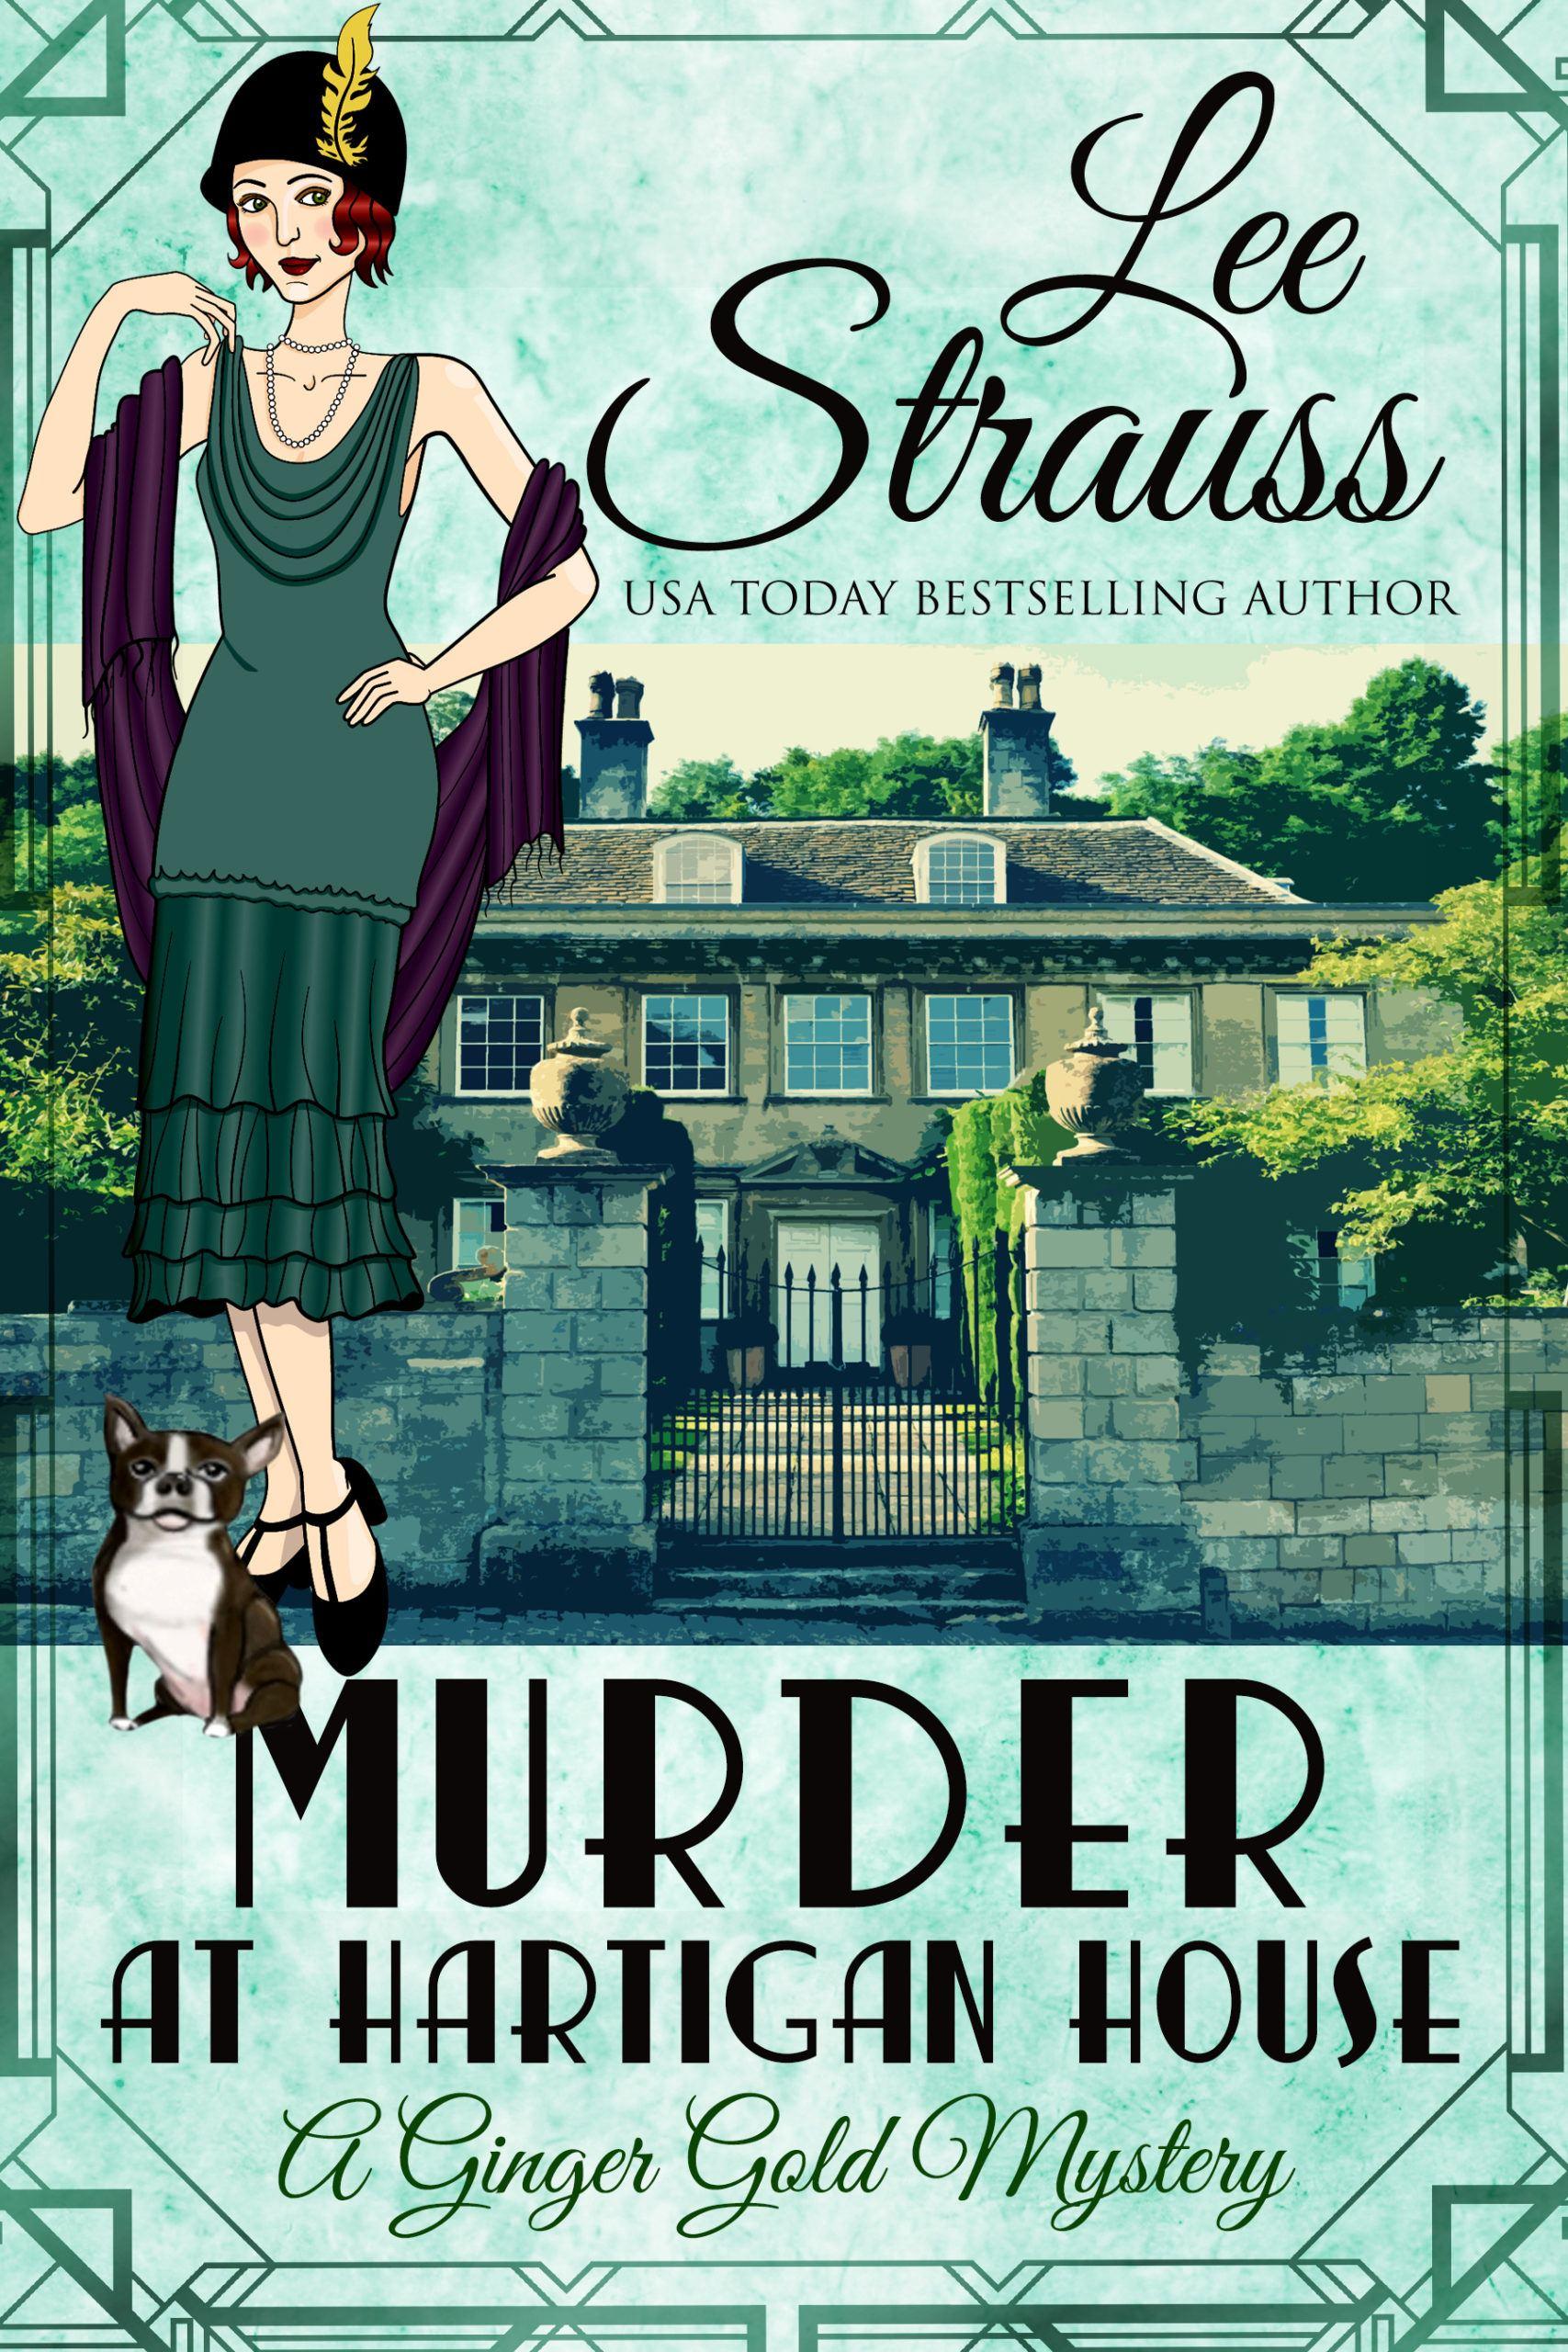 MurderHartiganHouse_1920s